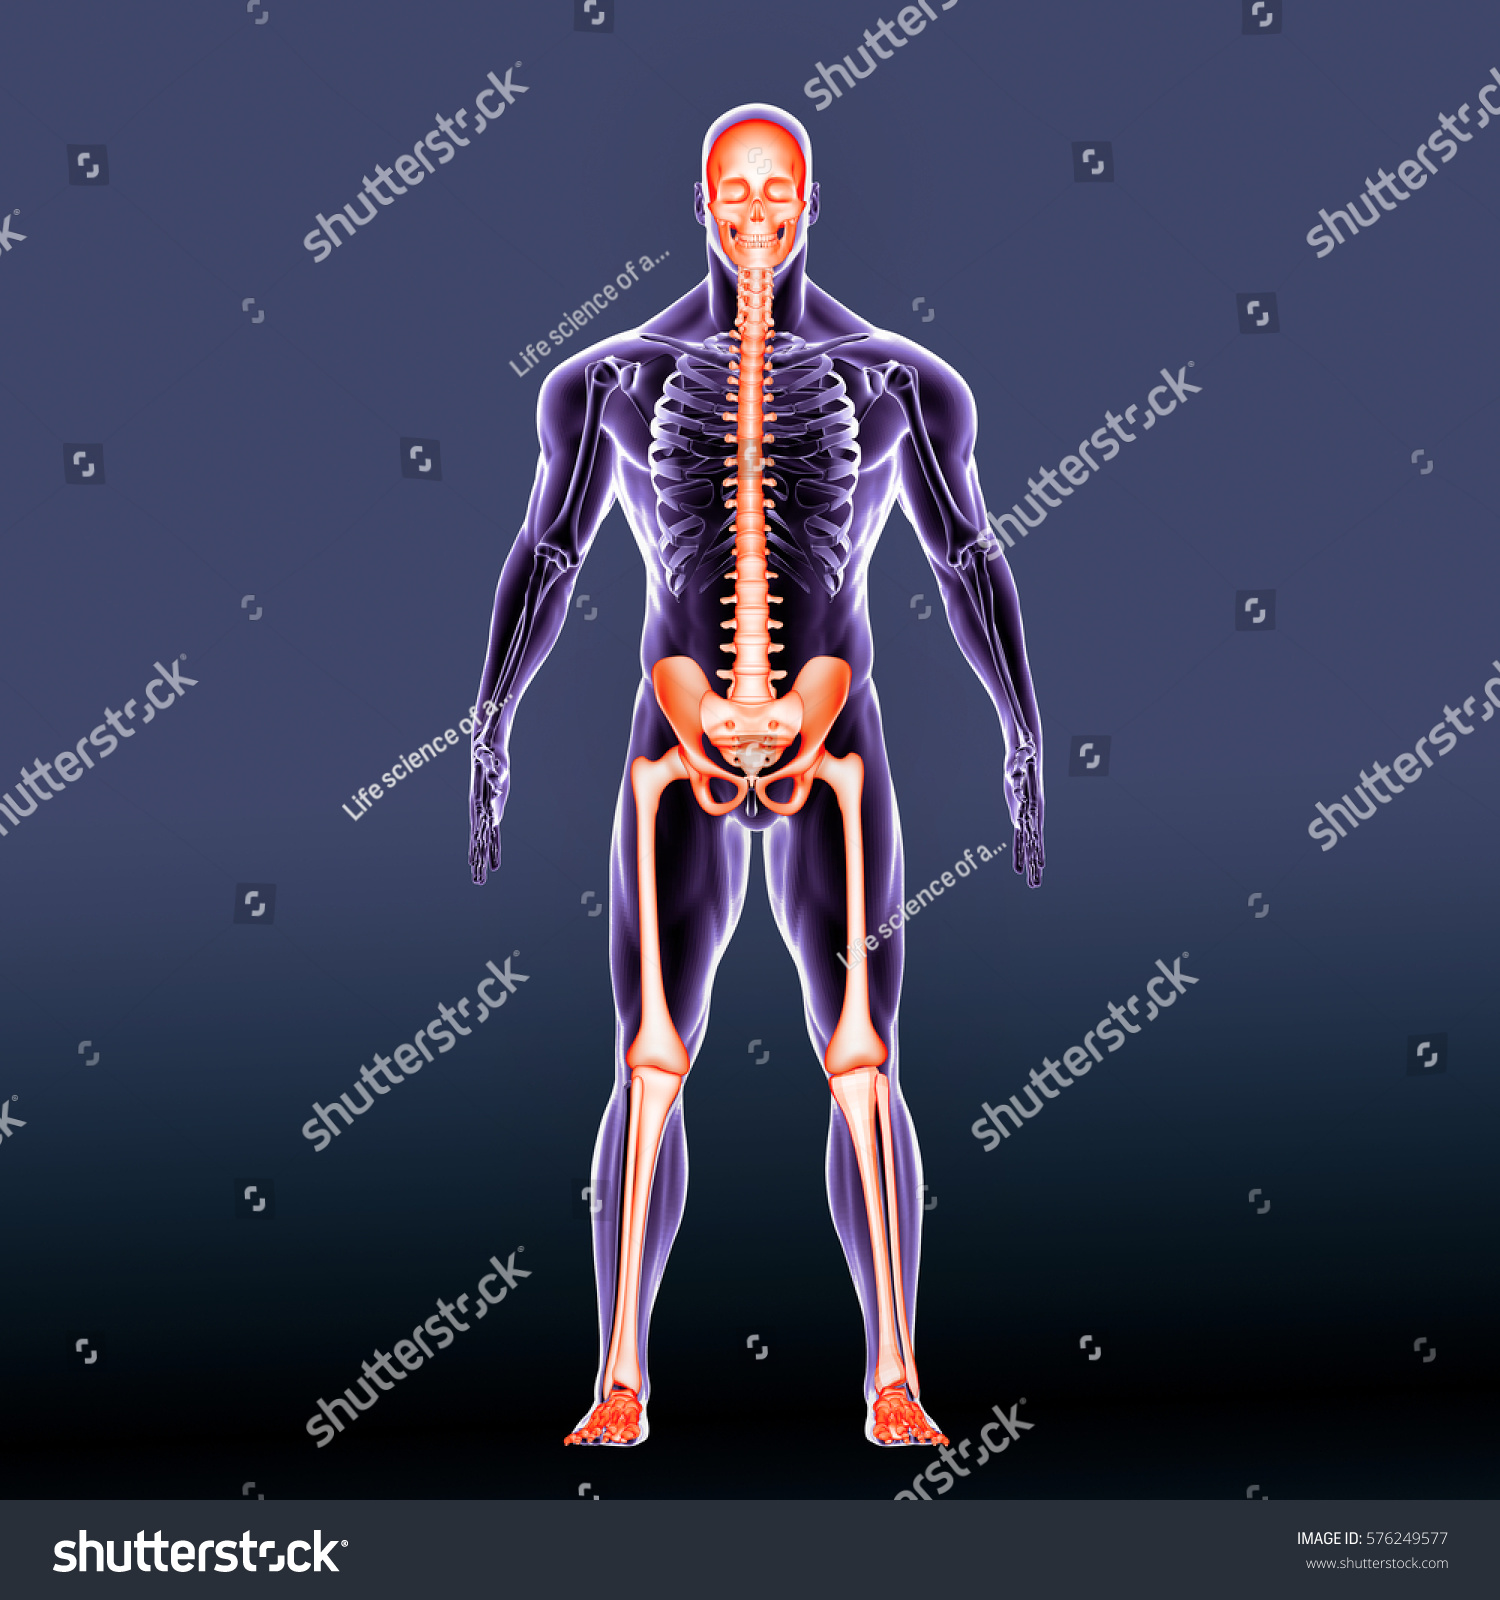 3 D Render Human Body Skeleton Anatomy Stock Illustration 576249577 ...